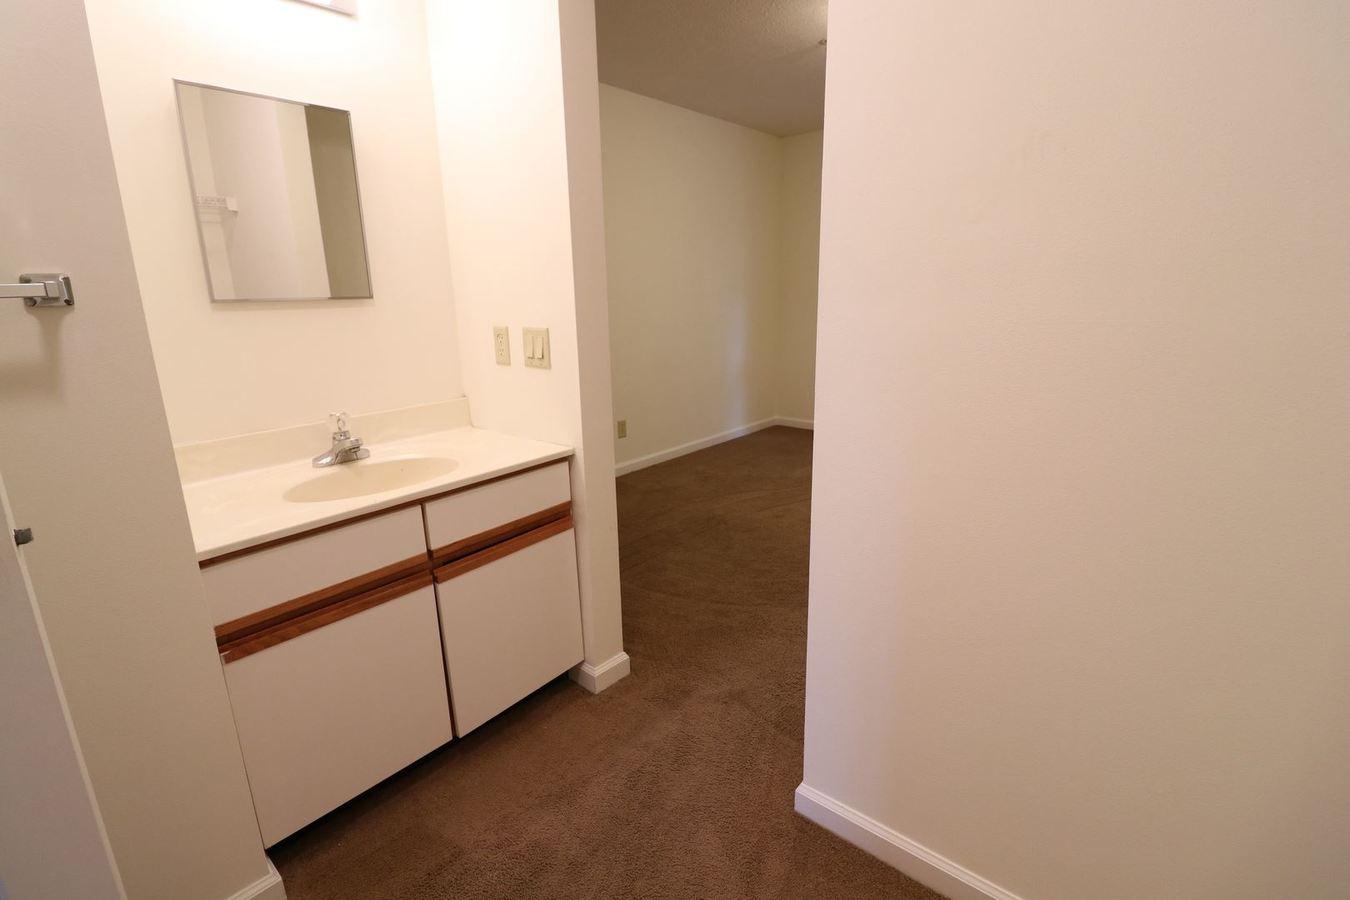 2 Bedrooms 1 Bathroom Apartment for rent at 1993 Water Street in Morgantown, WV